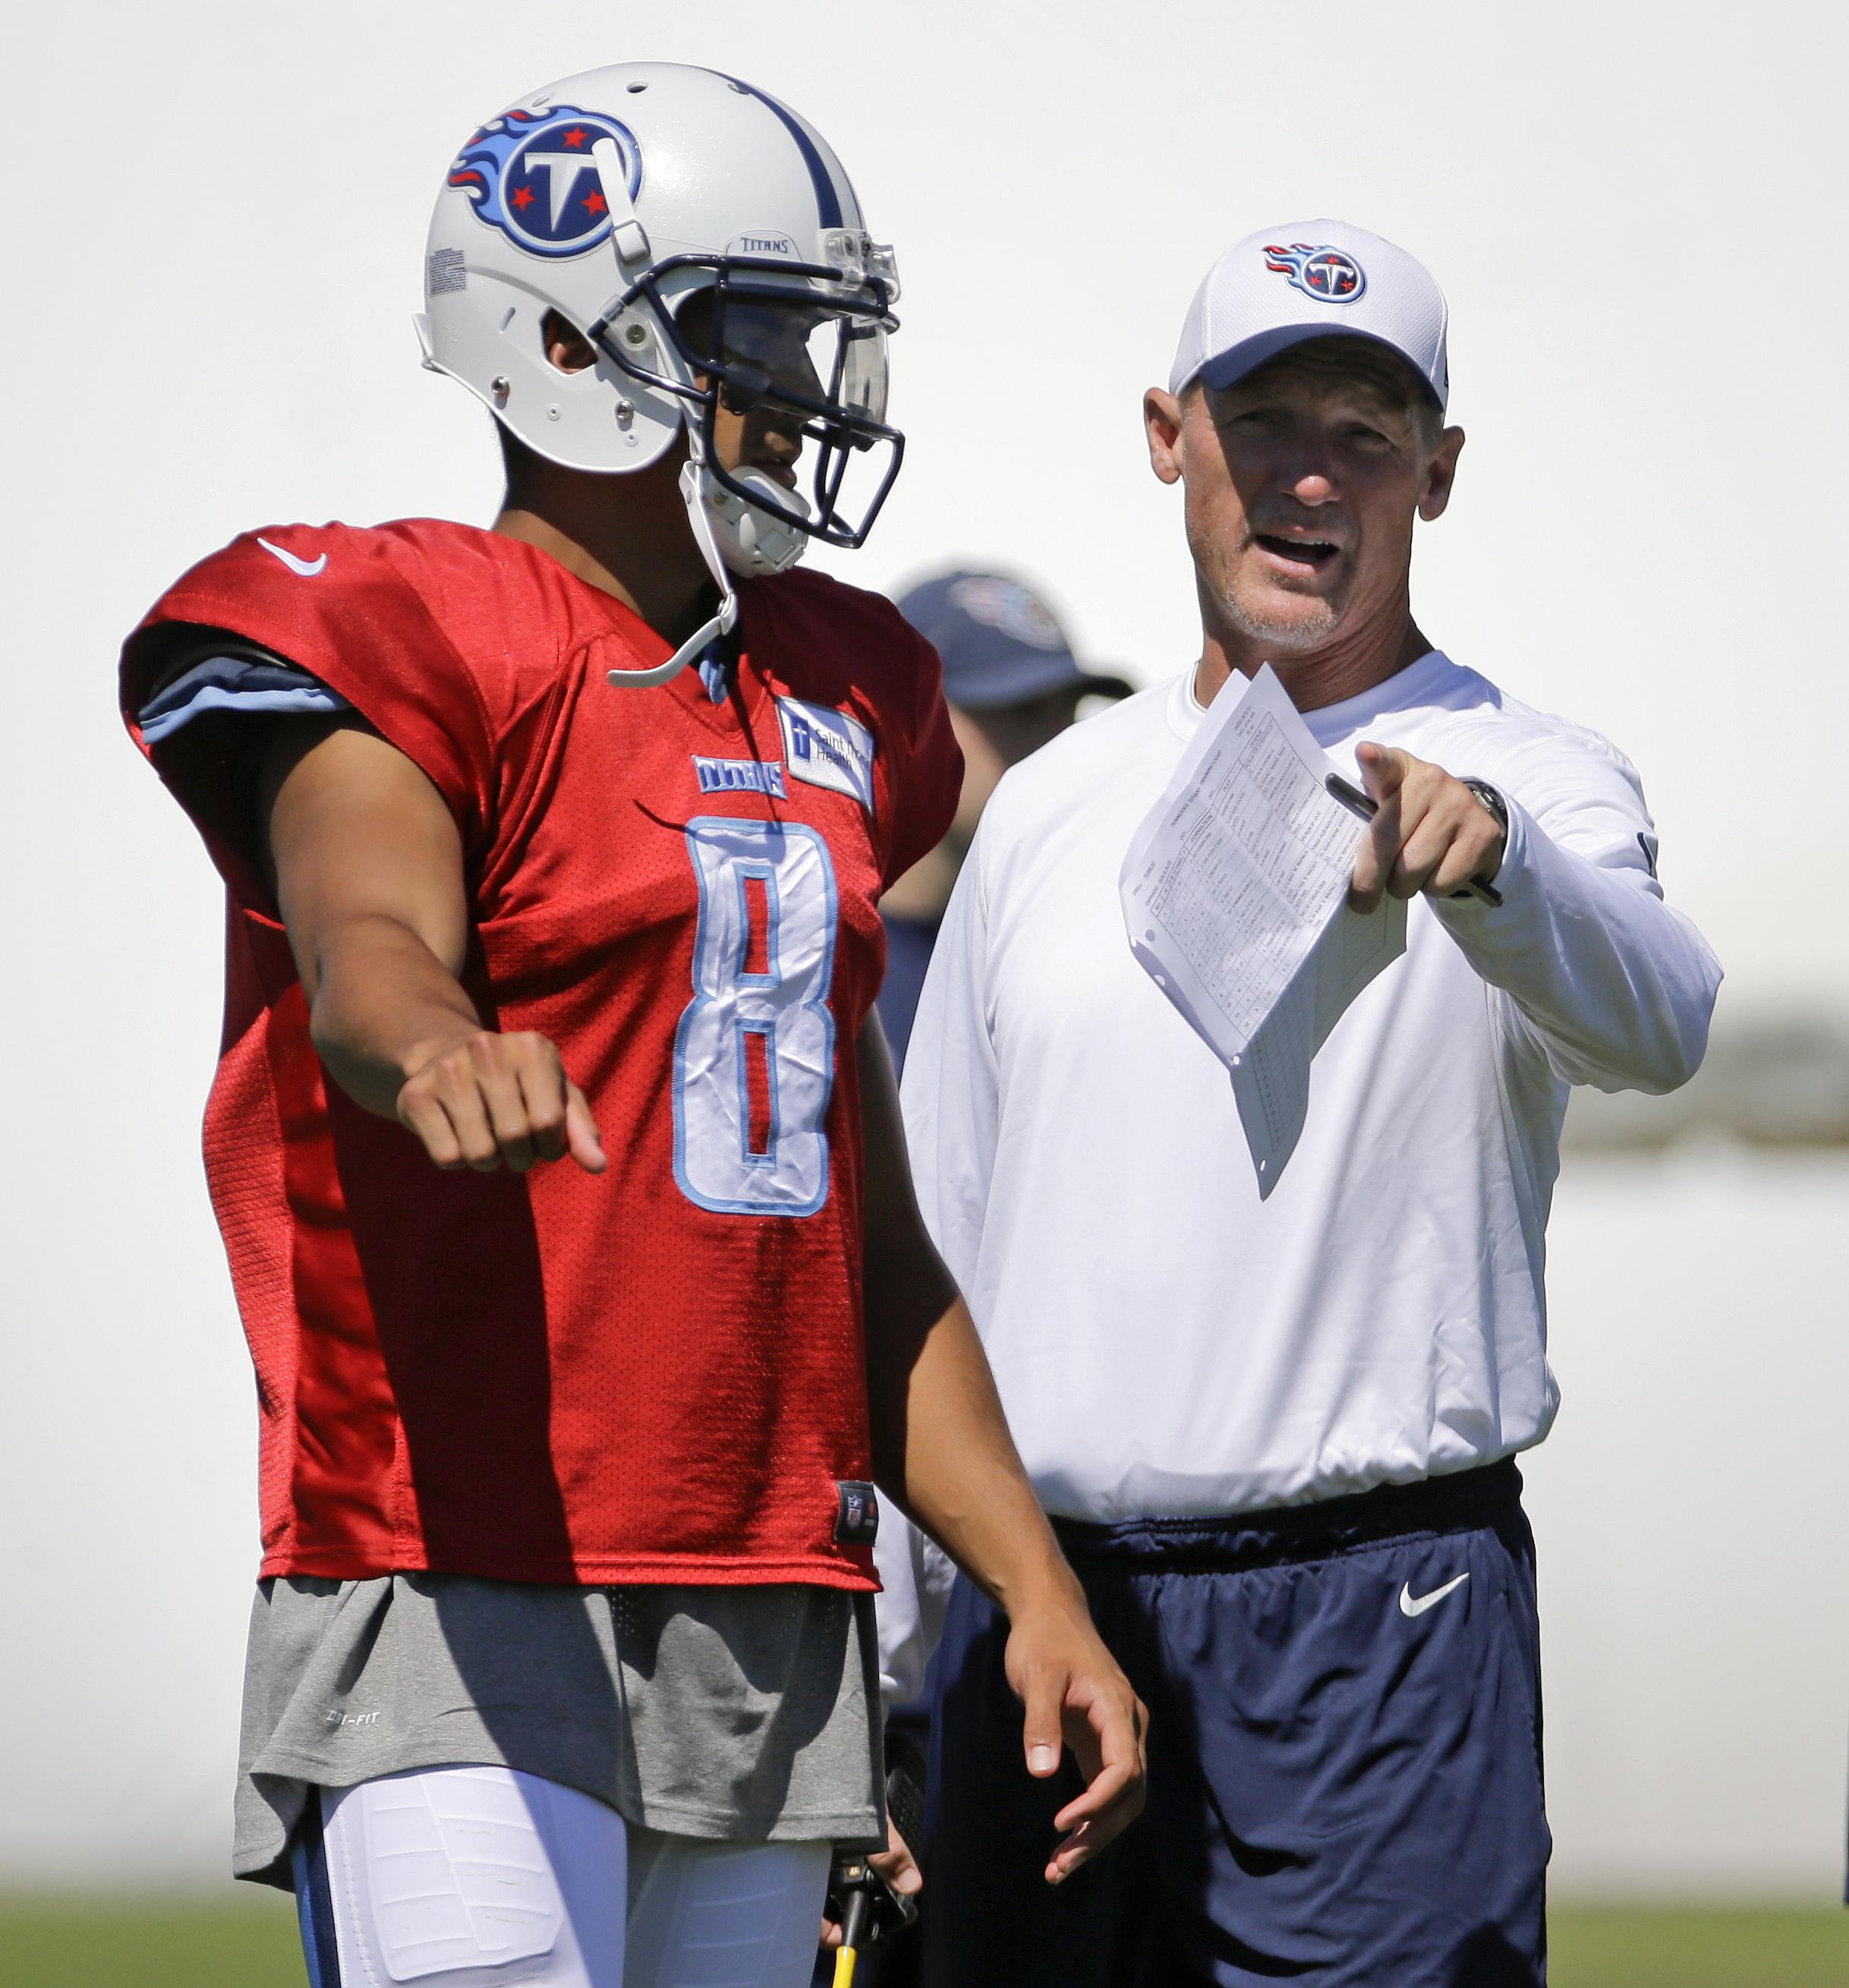 Tennessee Titans head coach Ken Whisenhunt, right, talks with quarterback Marcus Mariota (8) during NFL football training camp Sunday, Aug. 2, 2015, in Nashville, Tenn. (AP Photo/Mark Humphrey)